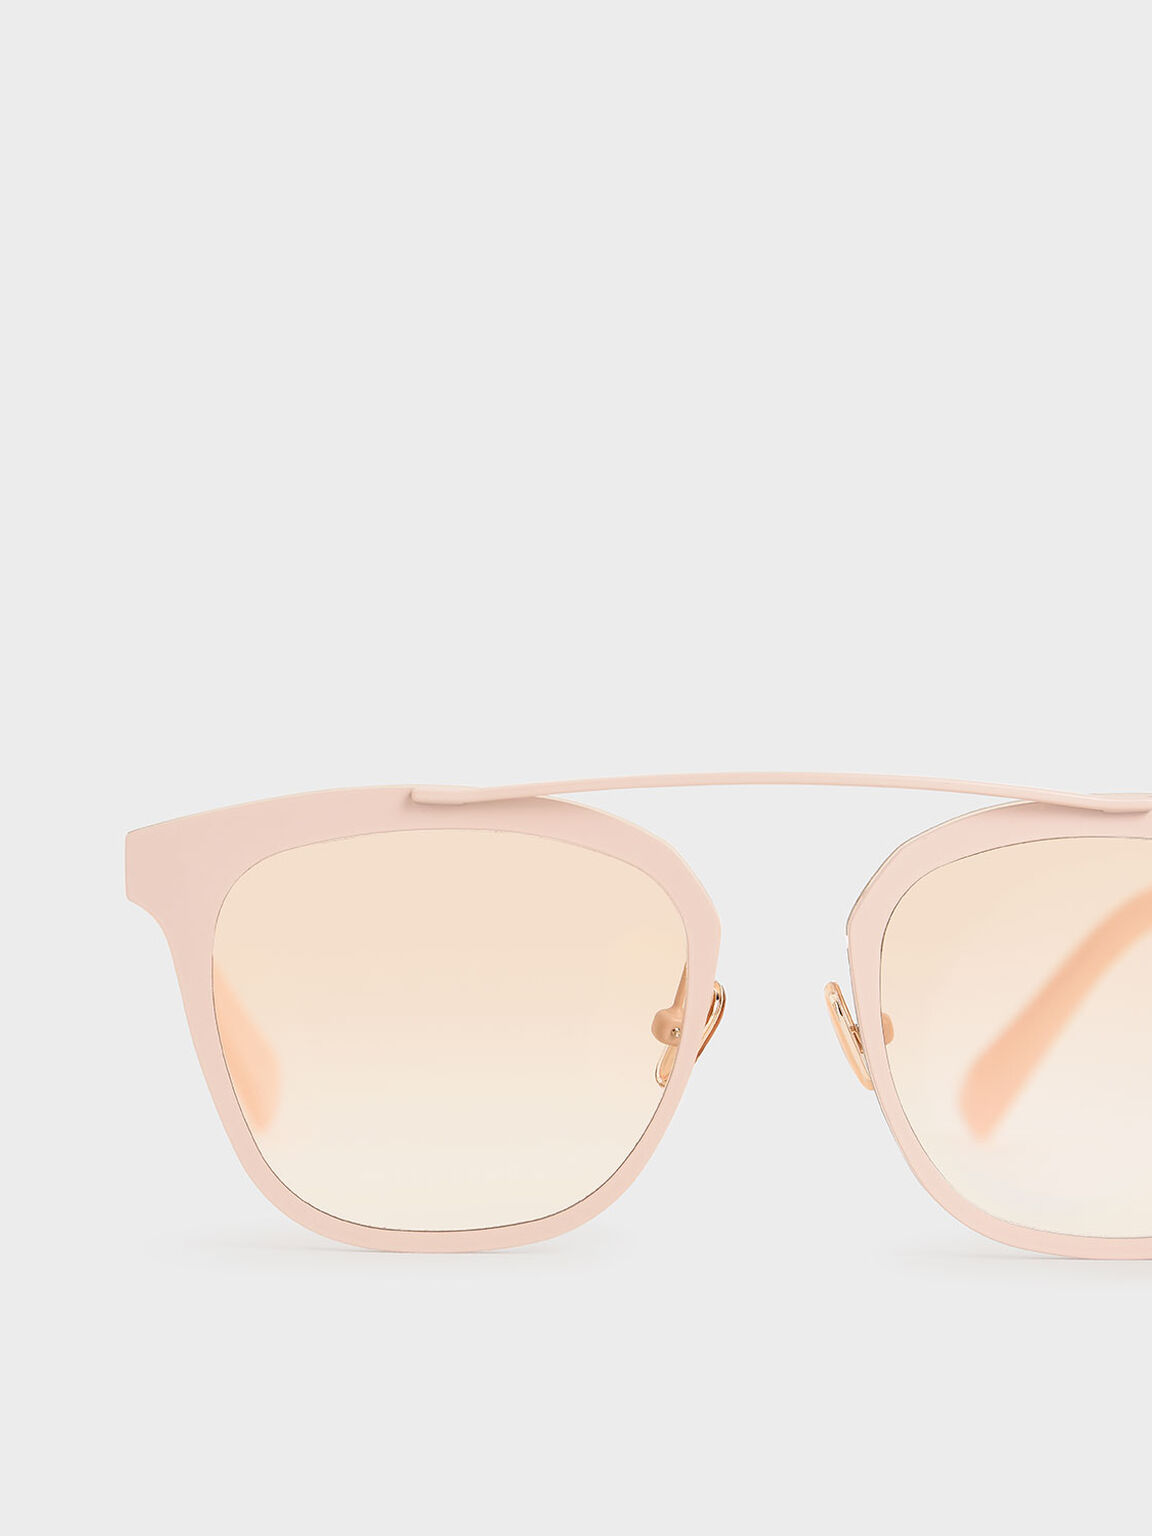 Kacamata Bingkai Logam, Pink, hi-res